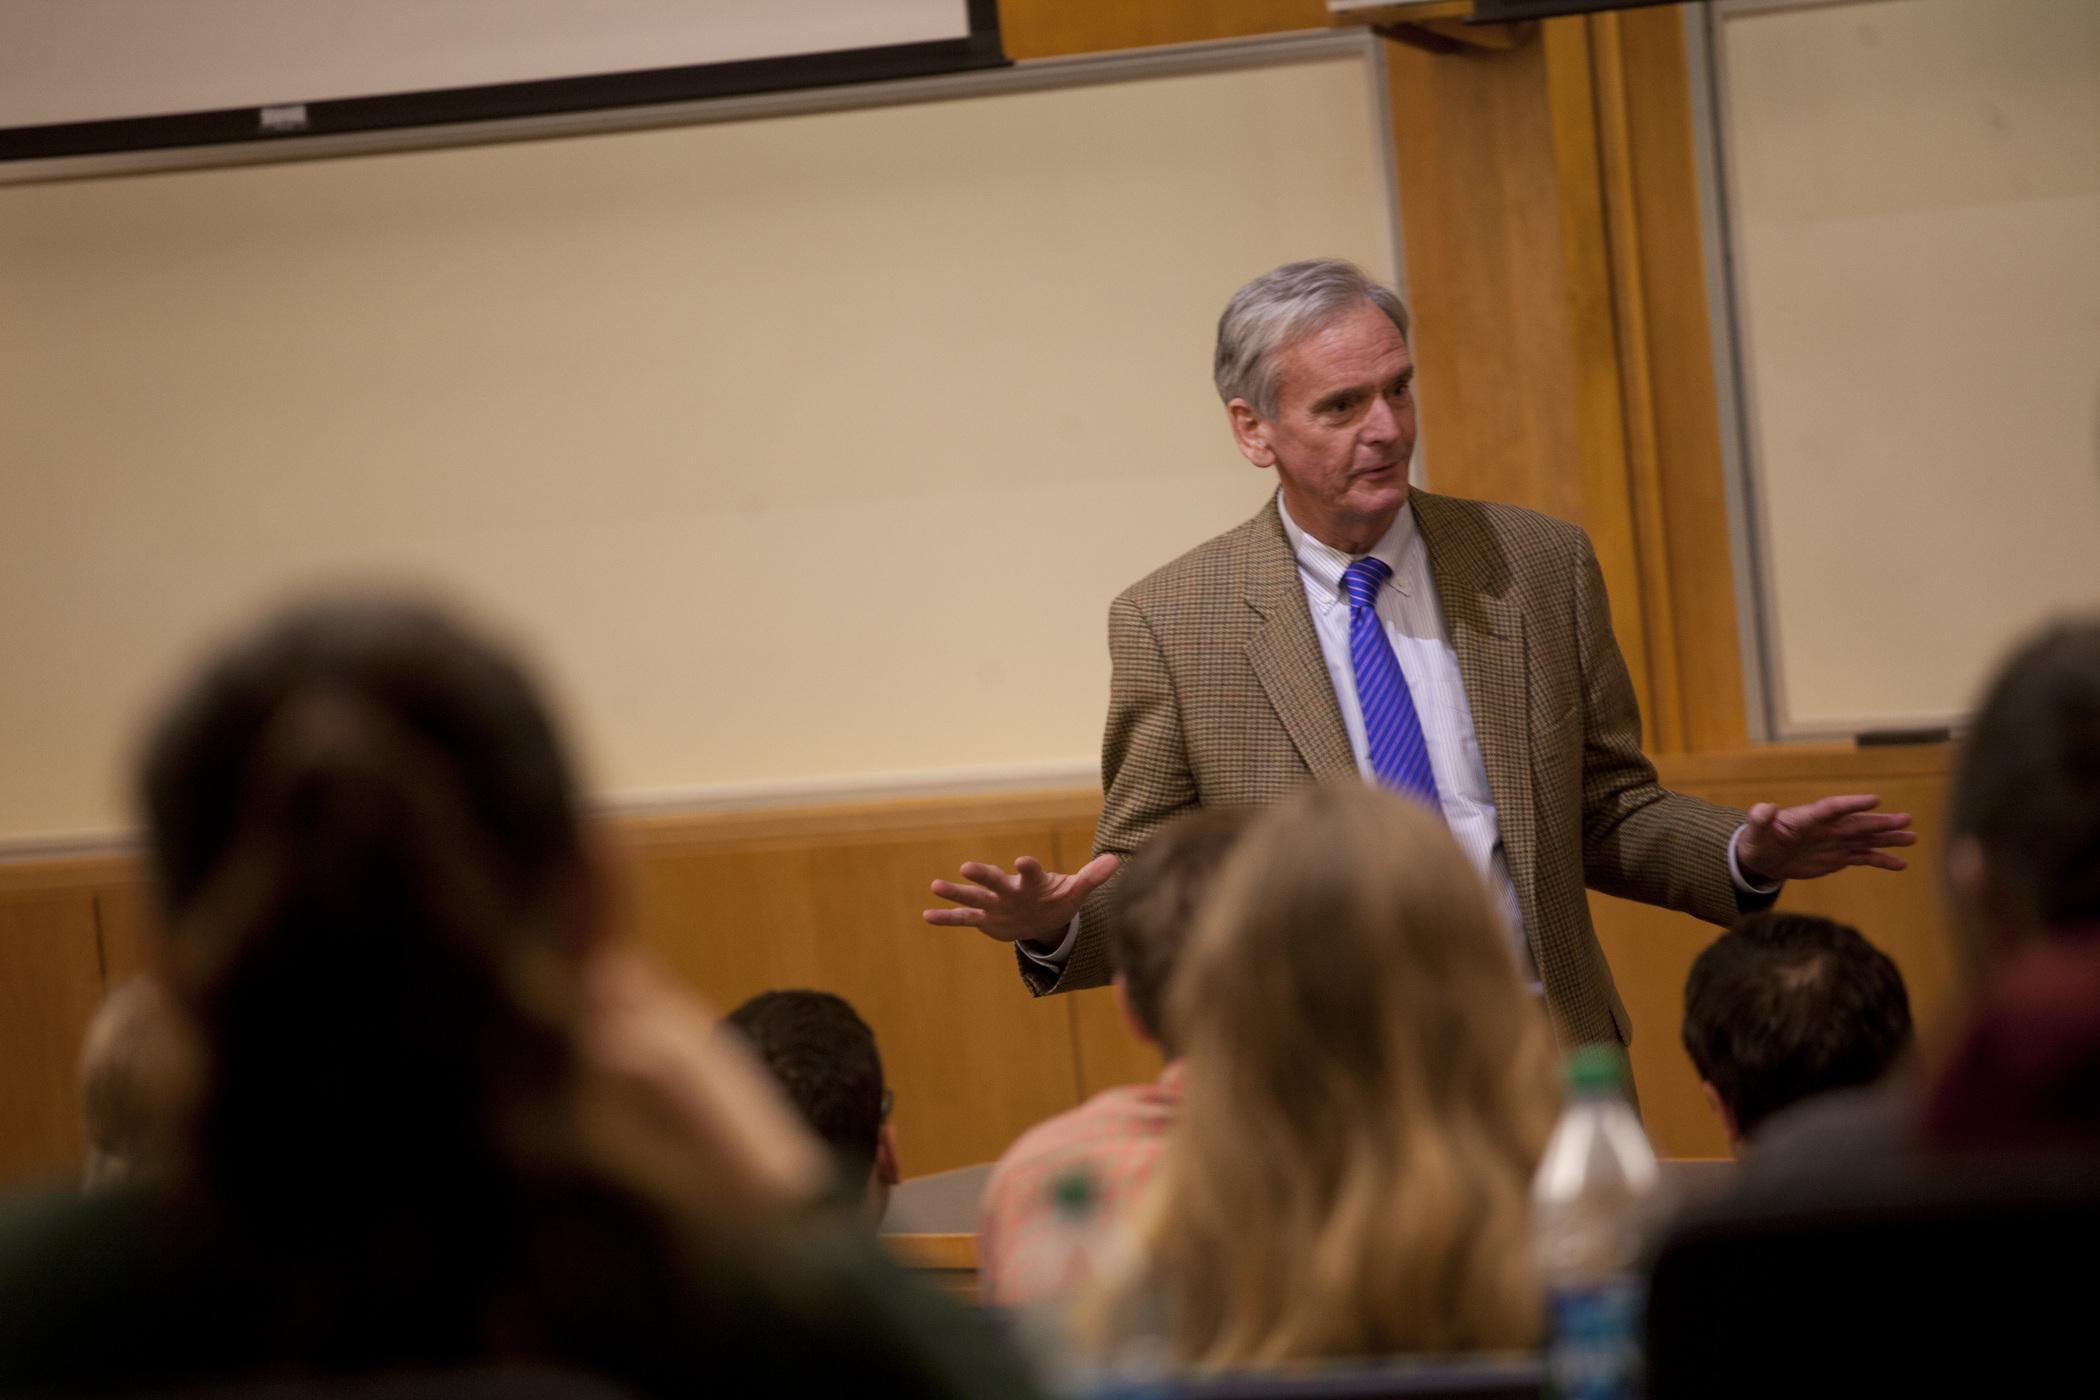 Killingstad Insight Series: Senator Judd Gregg on the Future and Federal Debt